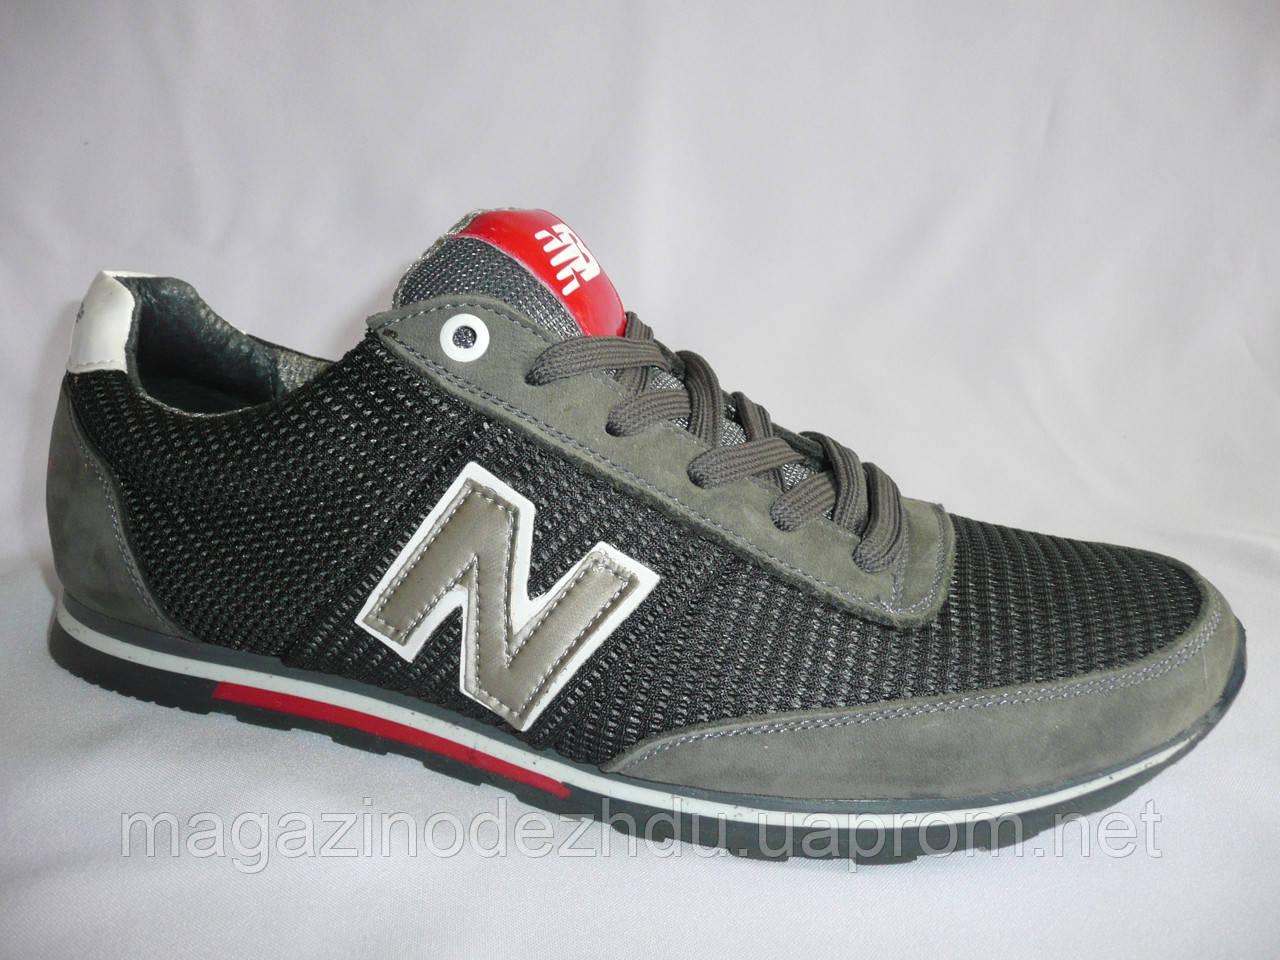 5e6ba9a07b16f8 Купить мужские кроссовки New Balance сетка в Днепропетровске ...